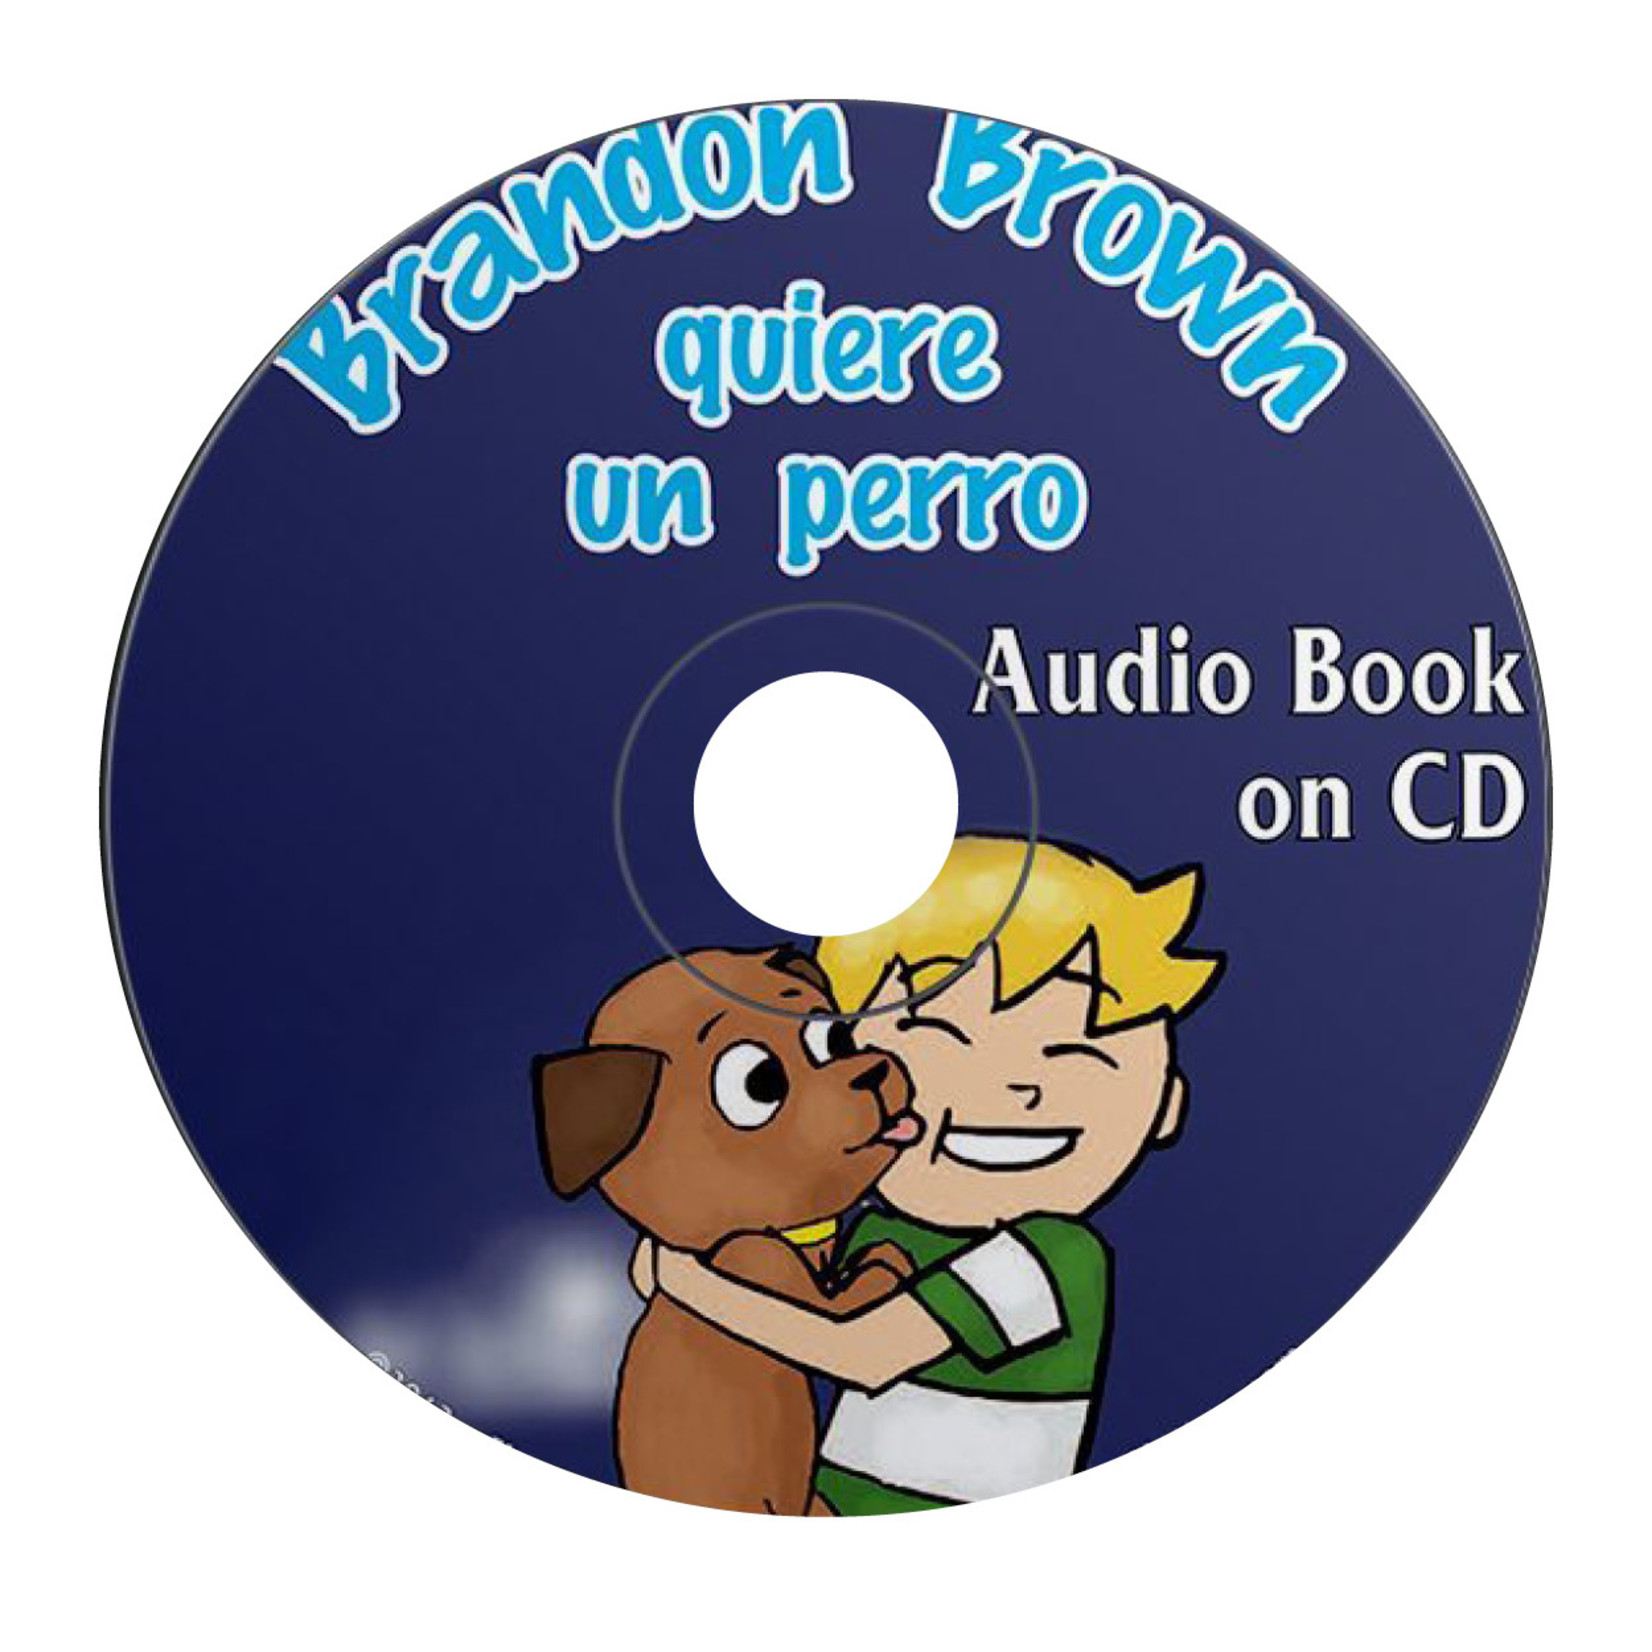 Fluency Matters Brandon Brown quiere un perro - Luisterboek